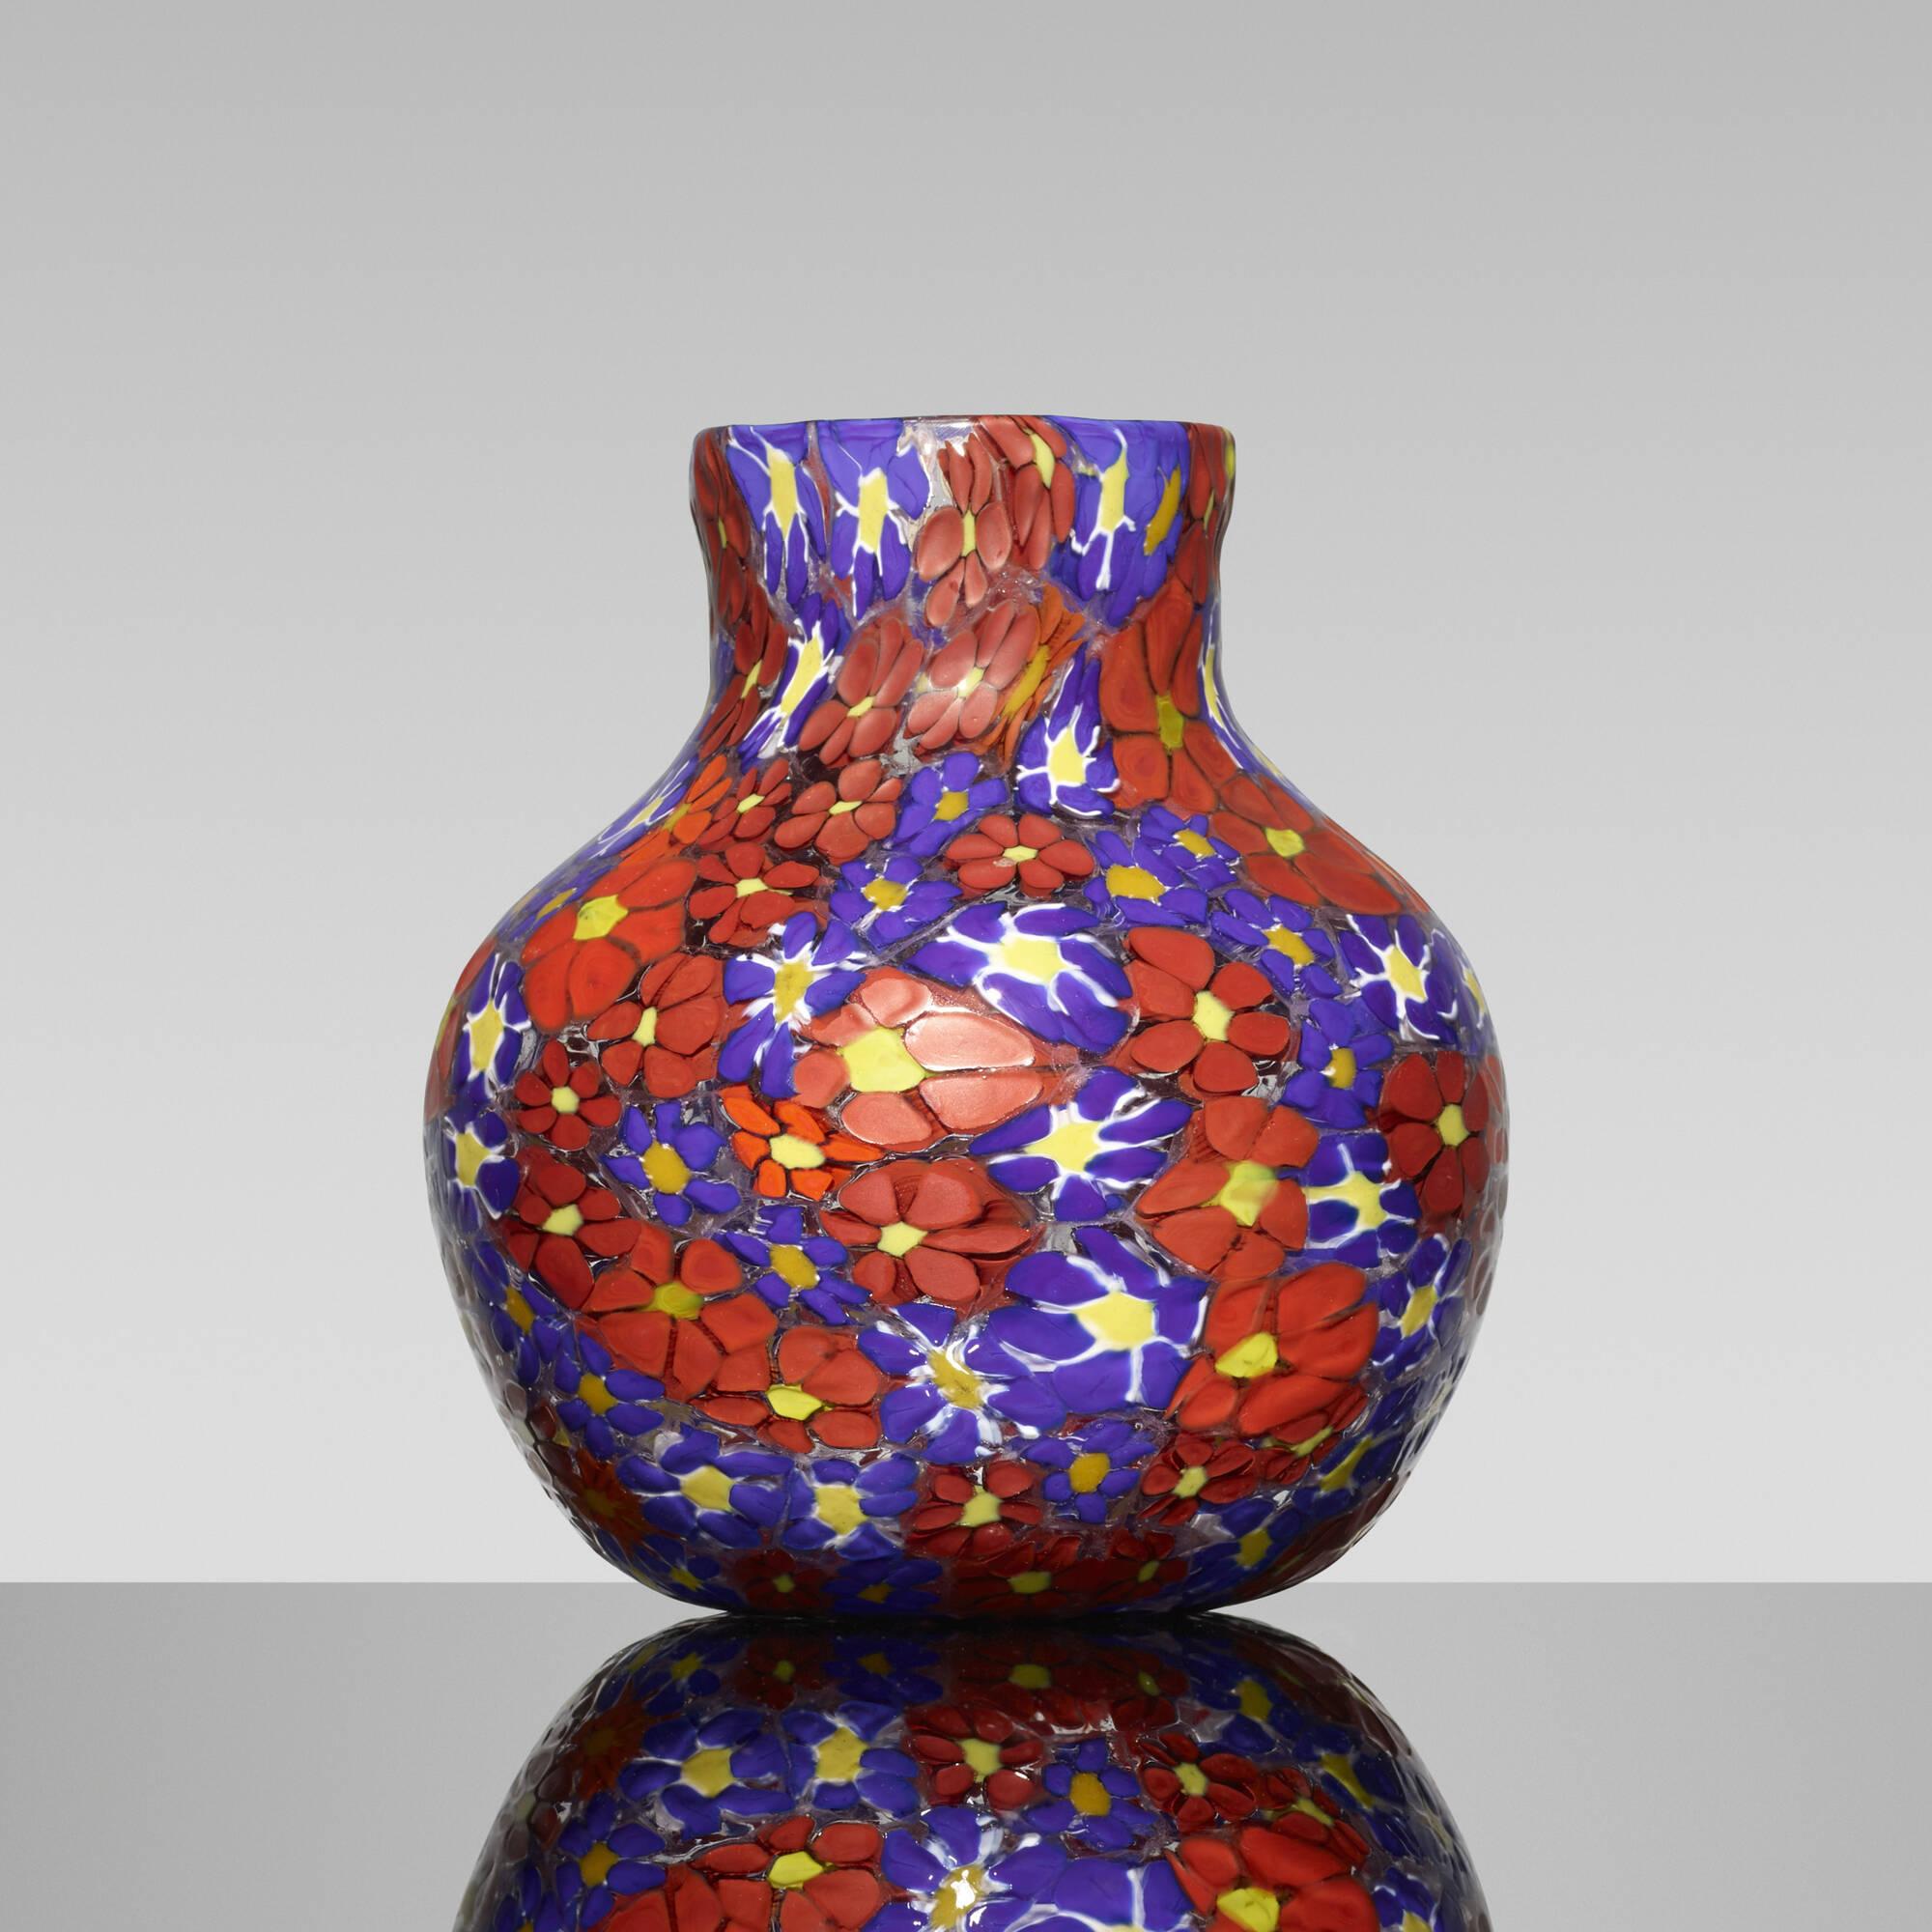 180: Fratelli Toso / Kiku vase (1 of 2)